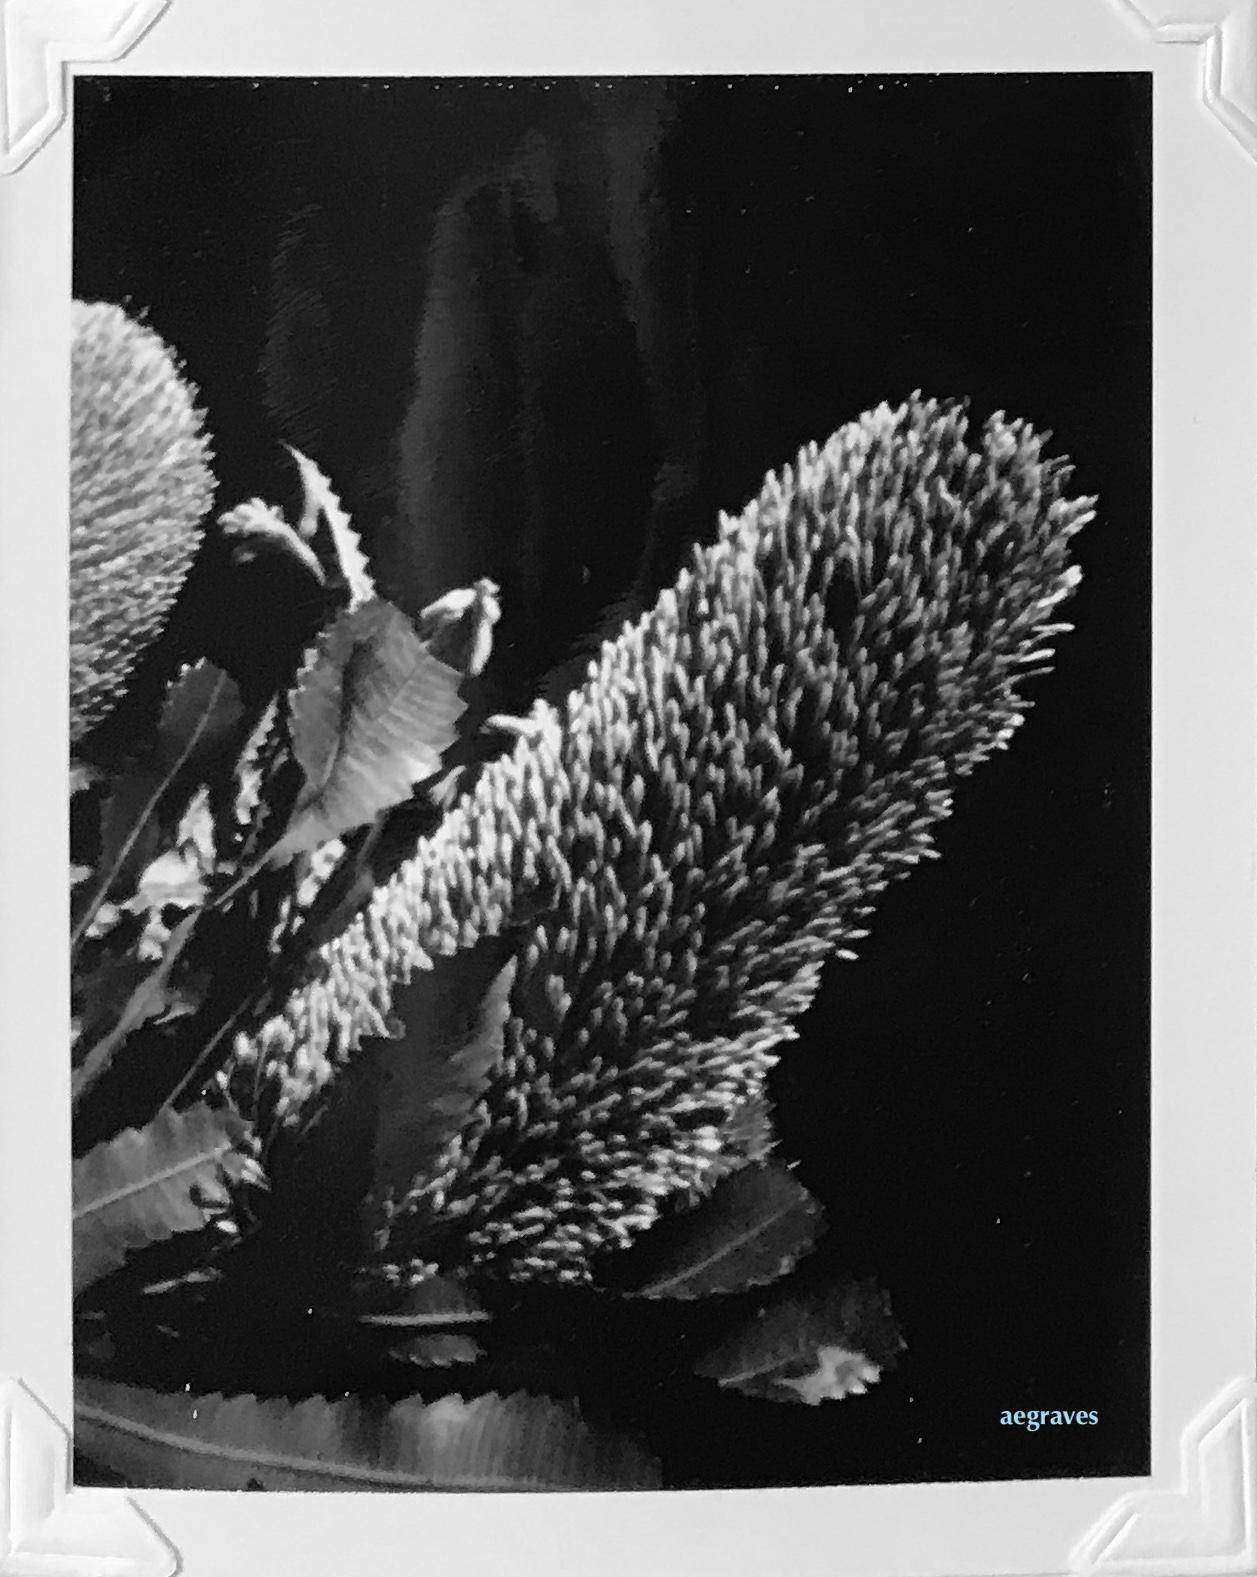 pinhole photo of a Banksia